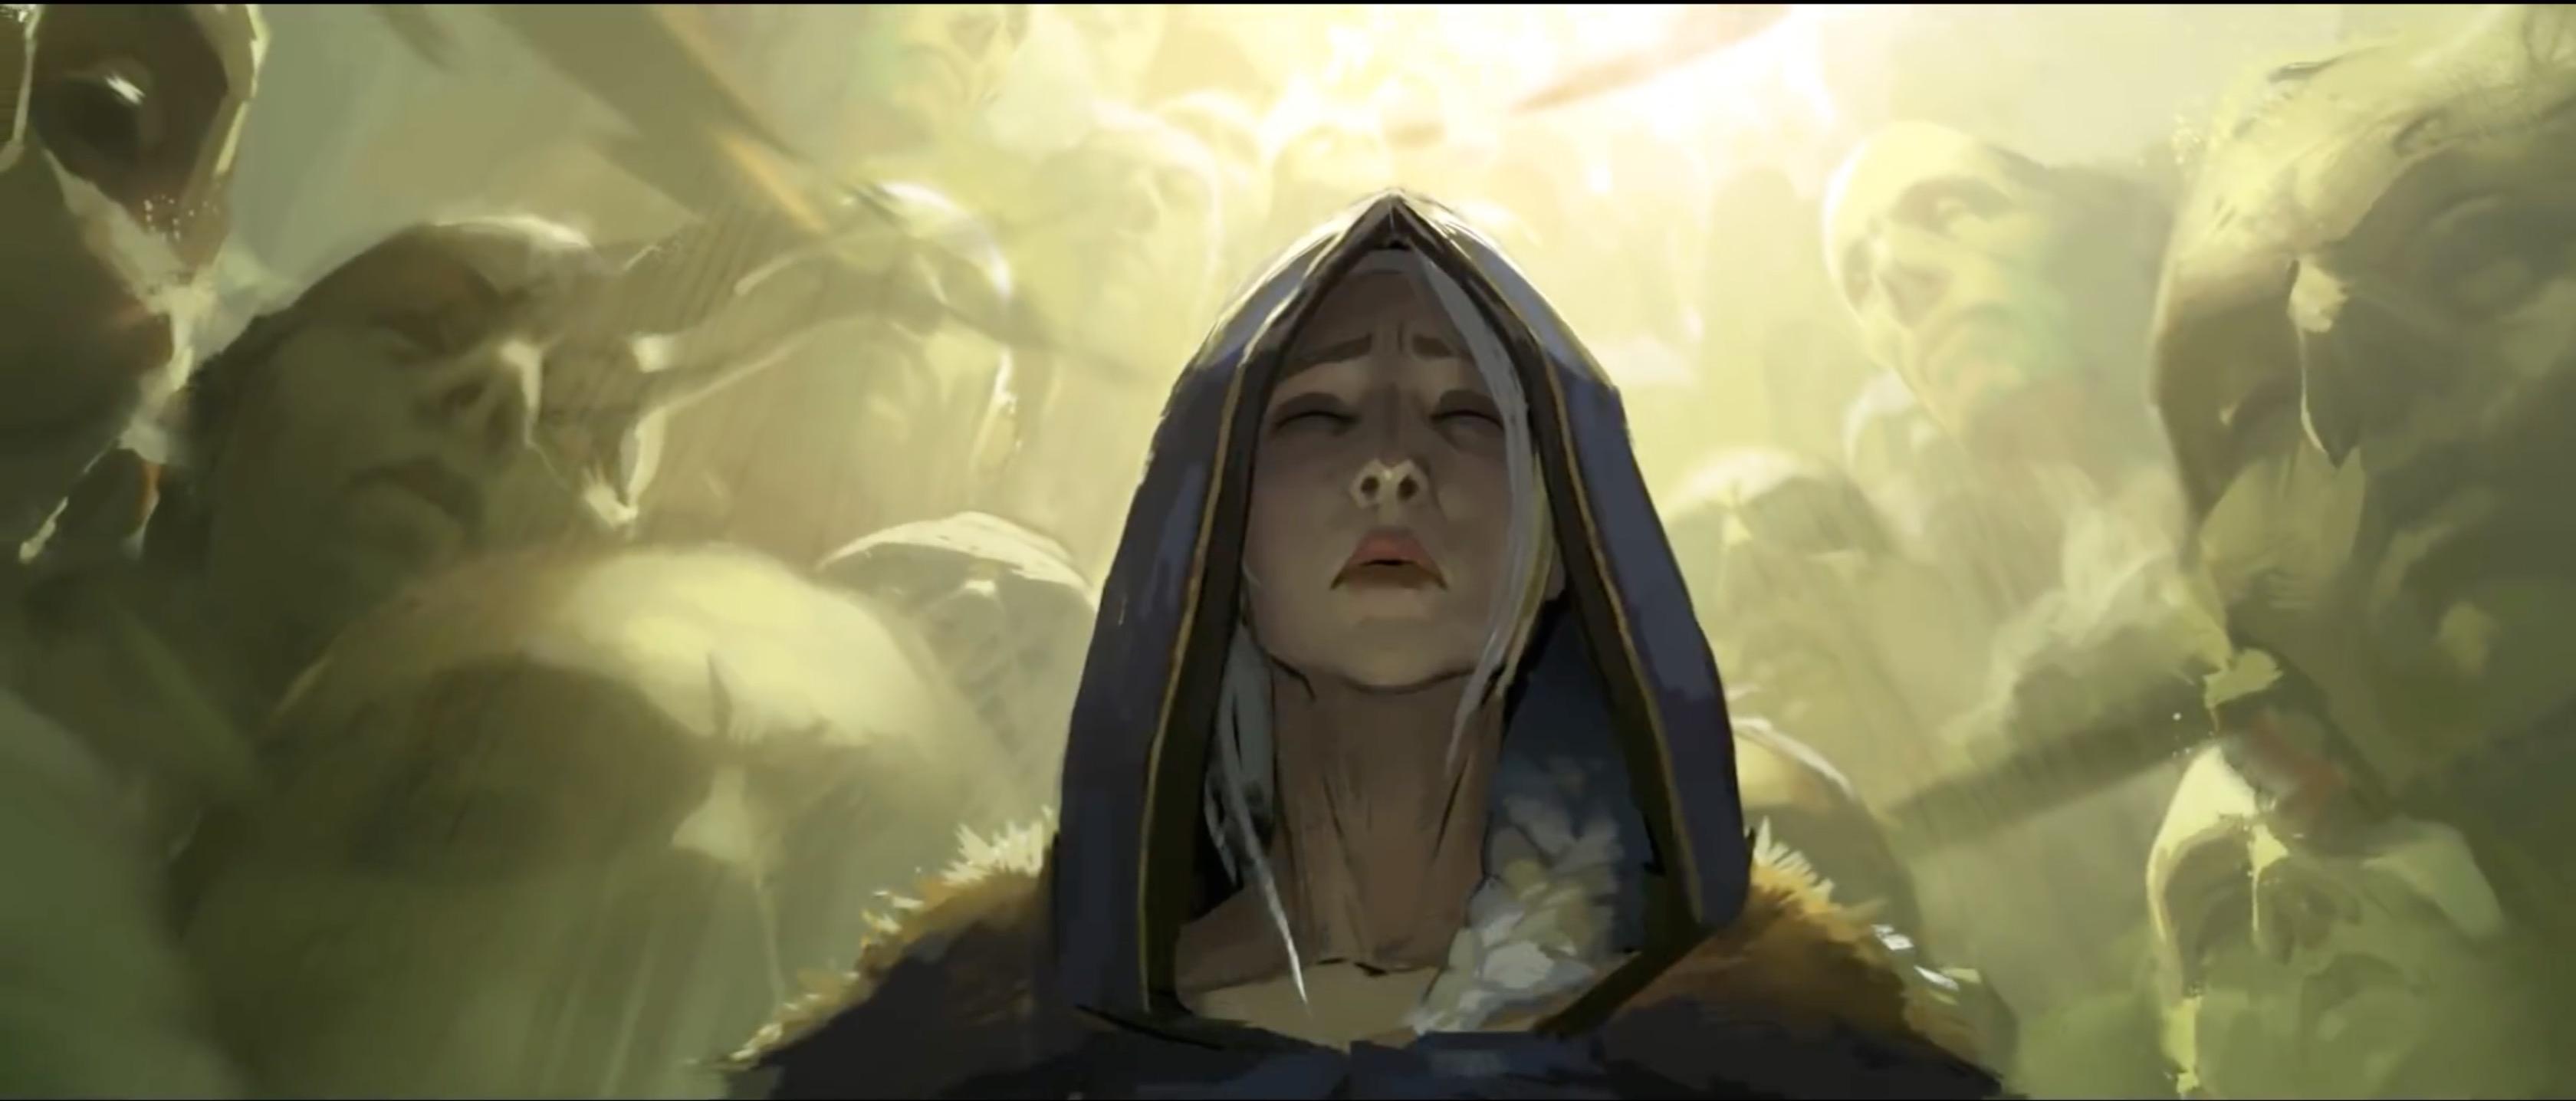 World Of Warcraft Animated Short 1414968 Hd Wallpaper